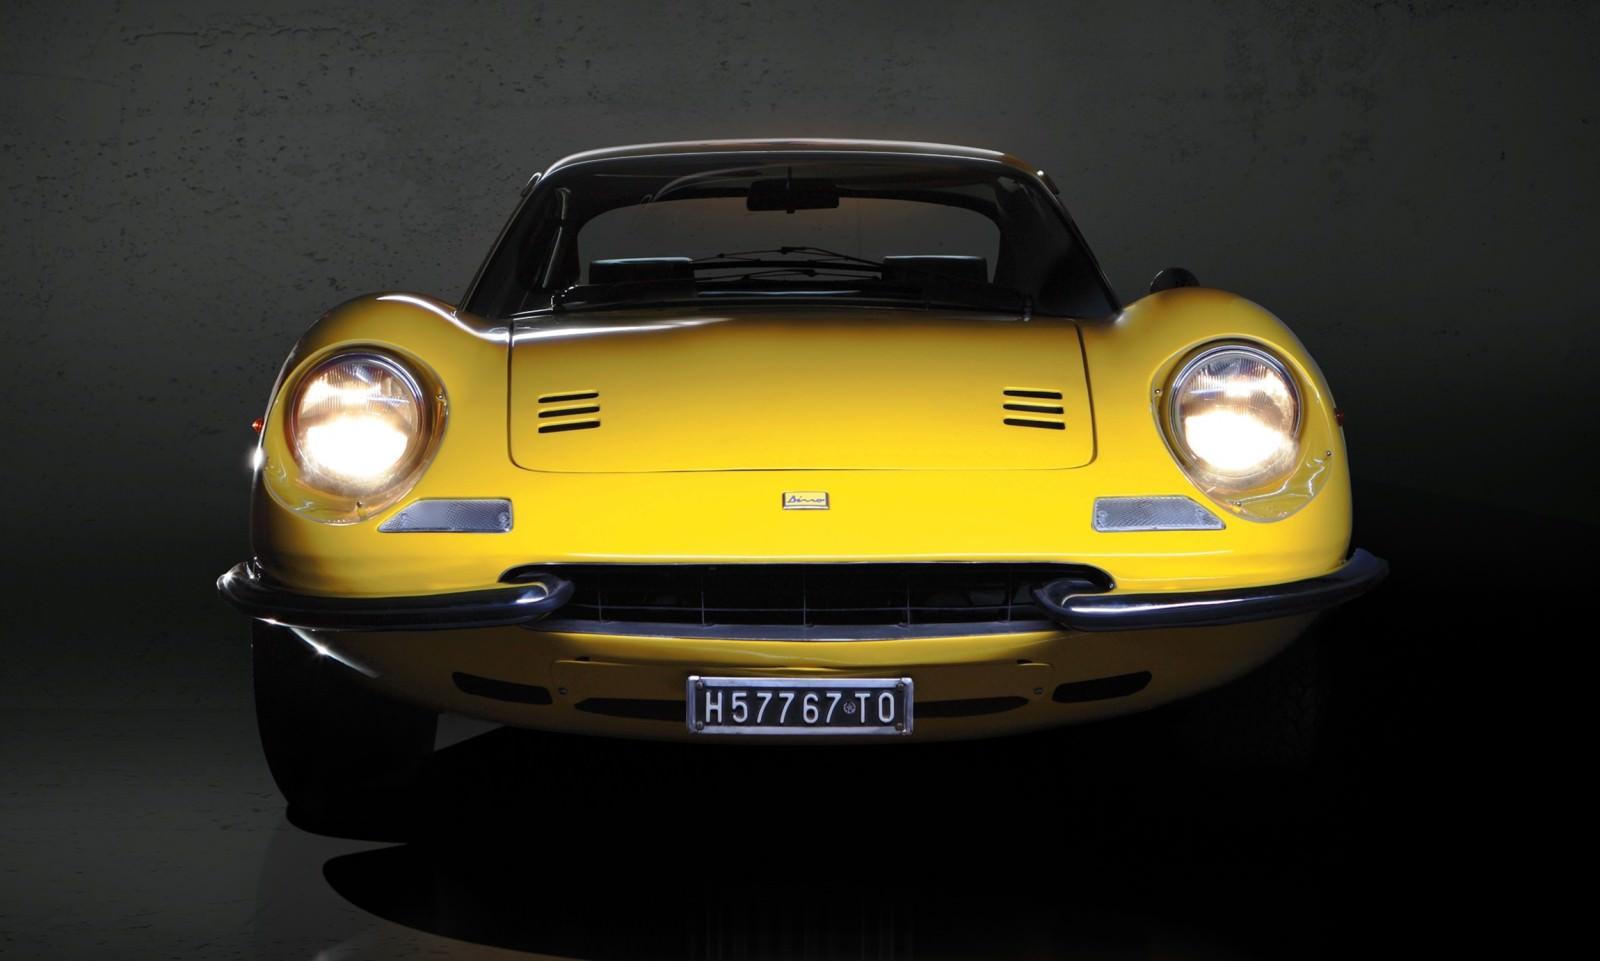 1970 Ferrari Dino 246GT L-Series